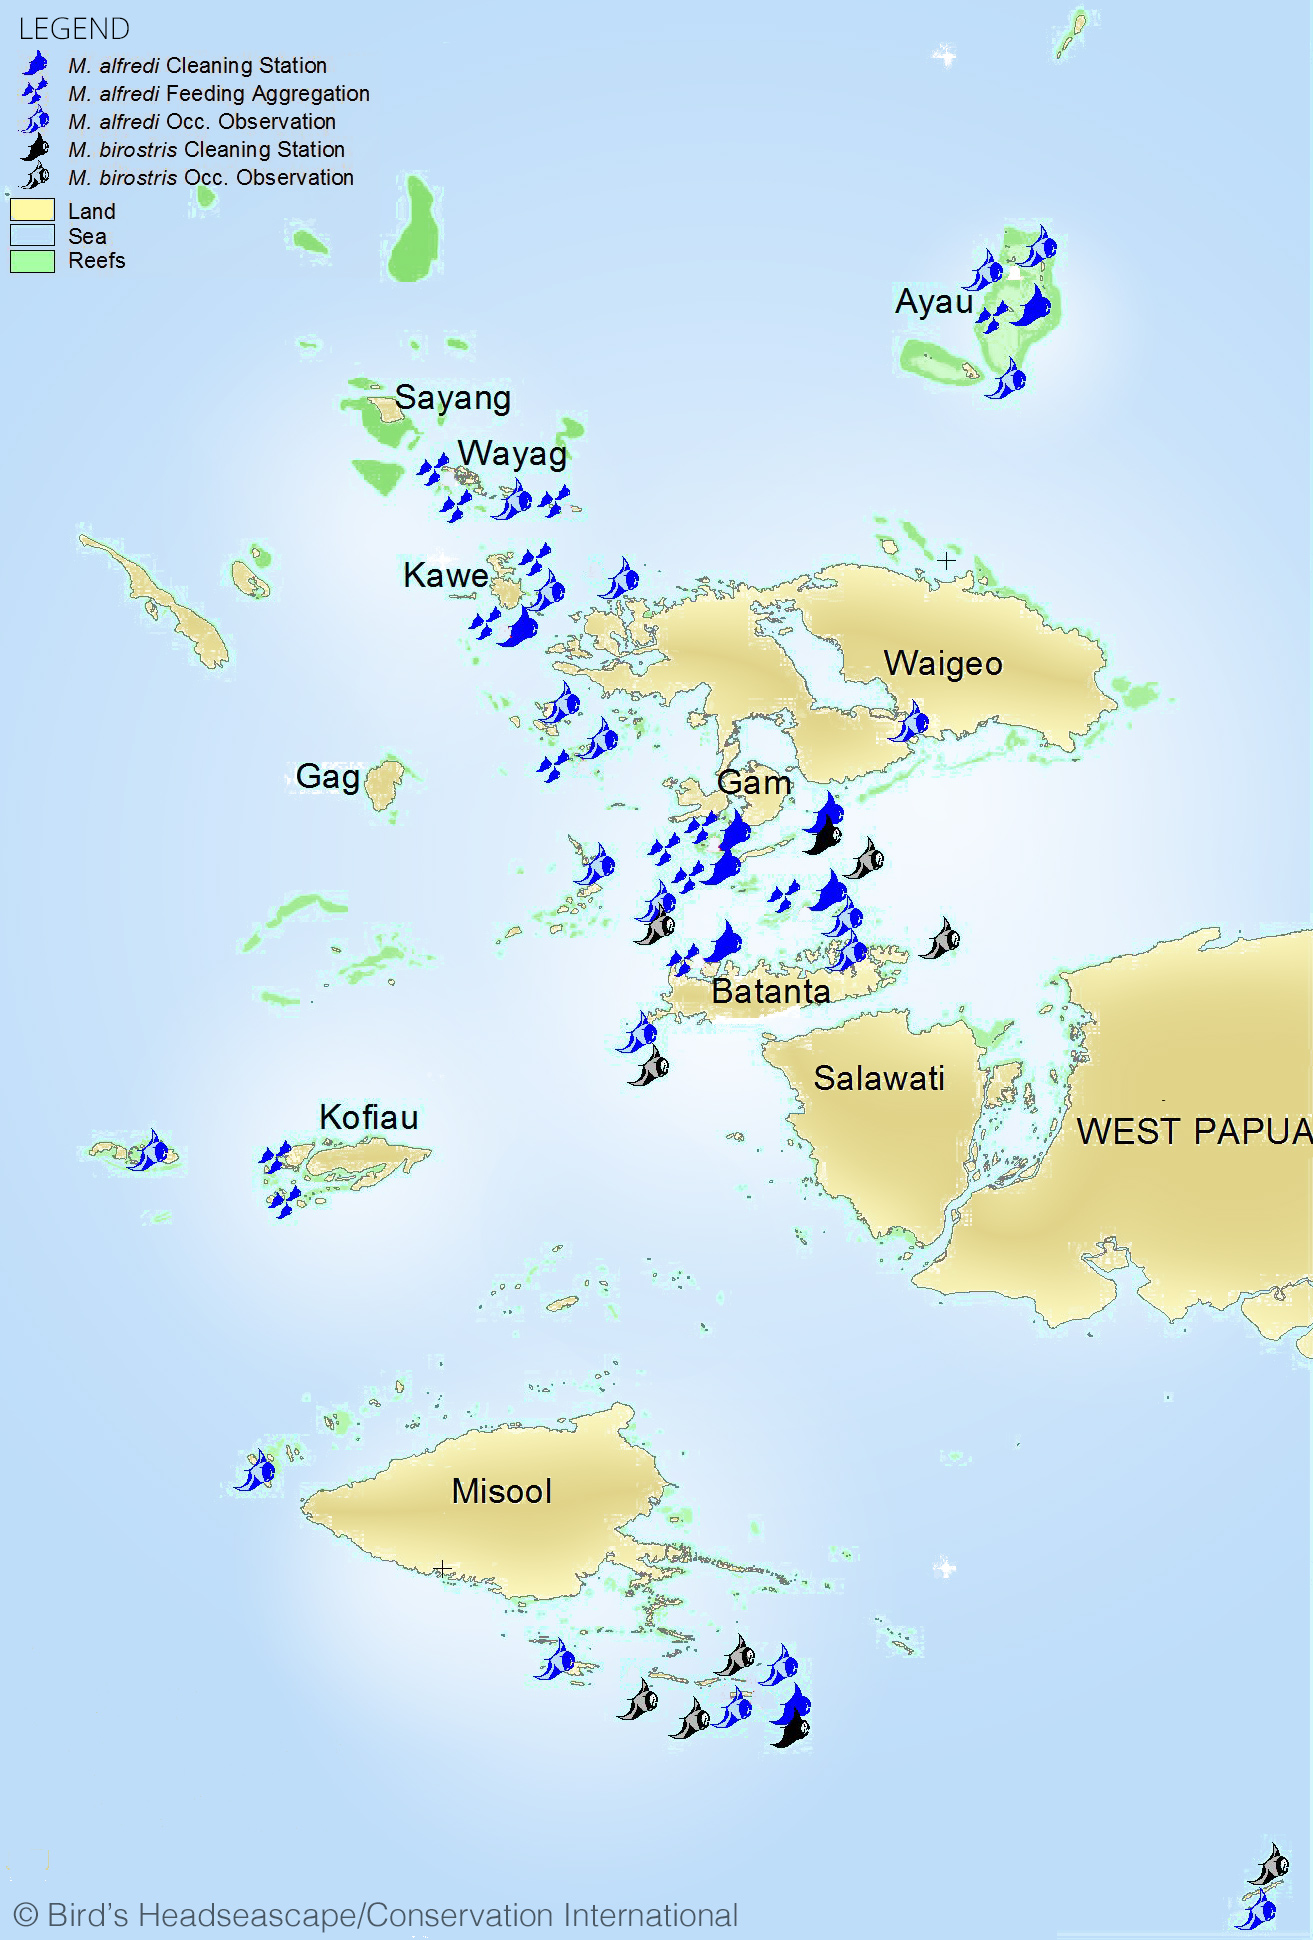 map_r4_gather_rev4r2_noinset_Web